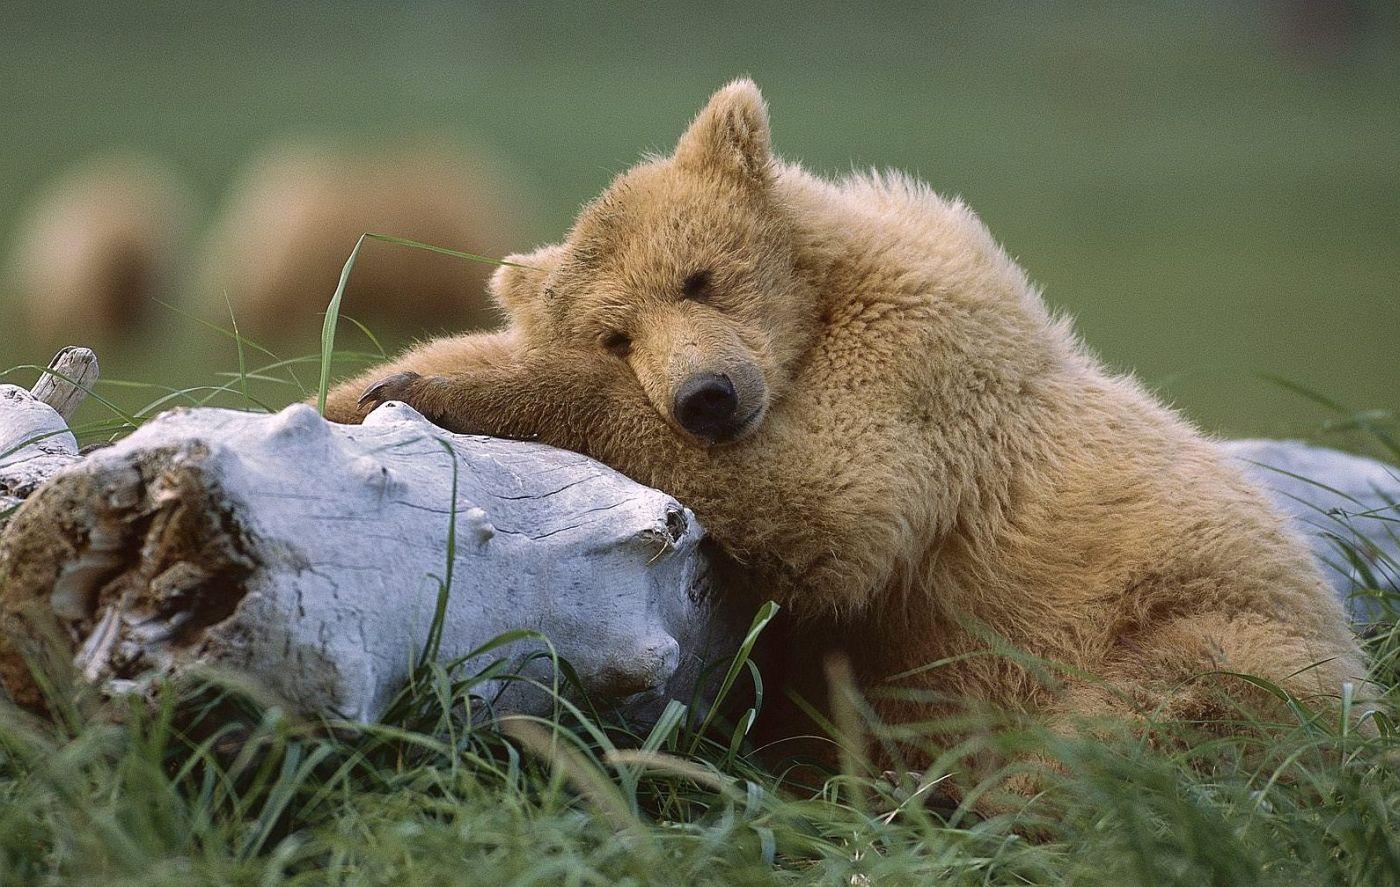 http://www.bartcop.com/tired-bear.jpg